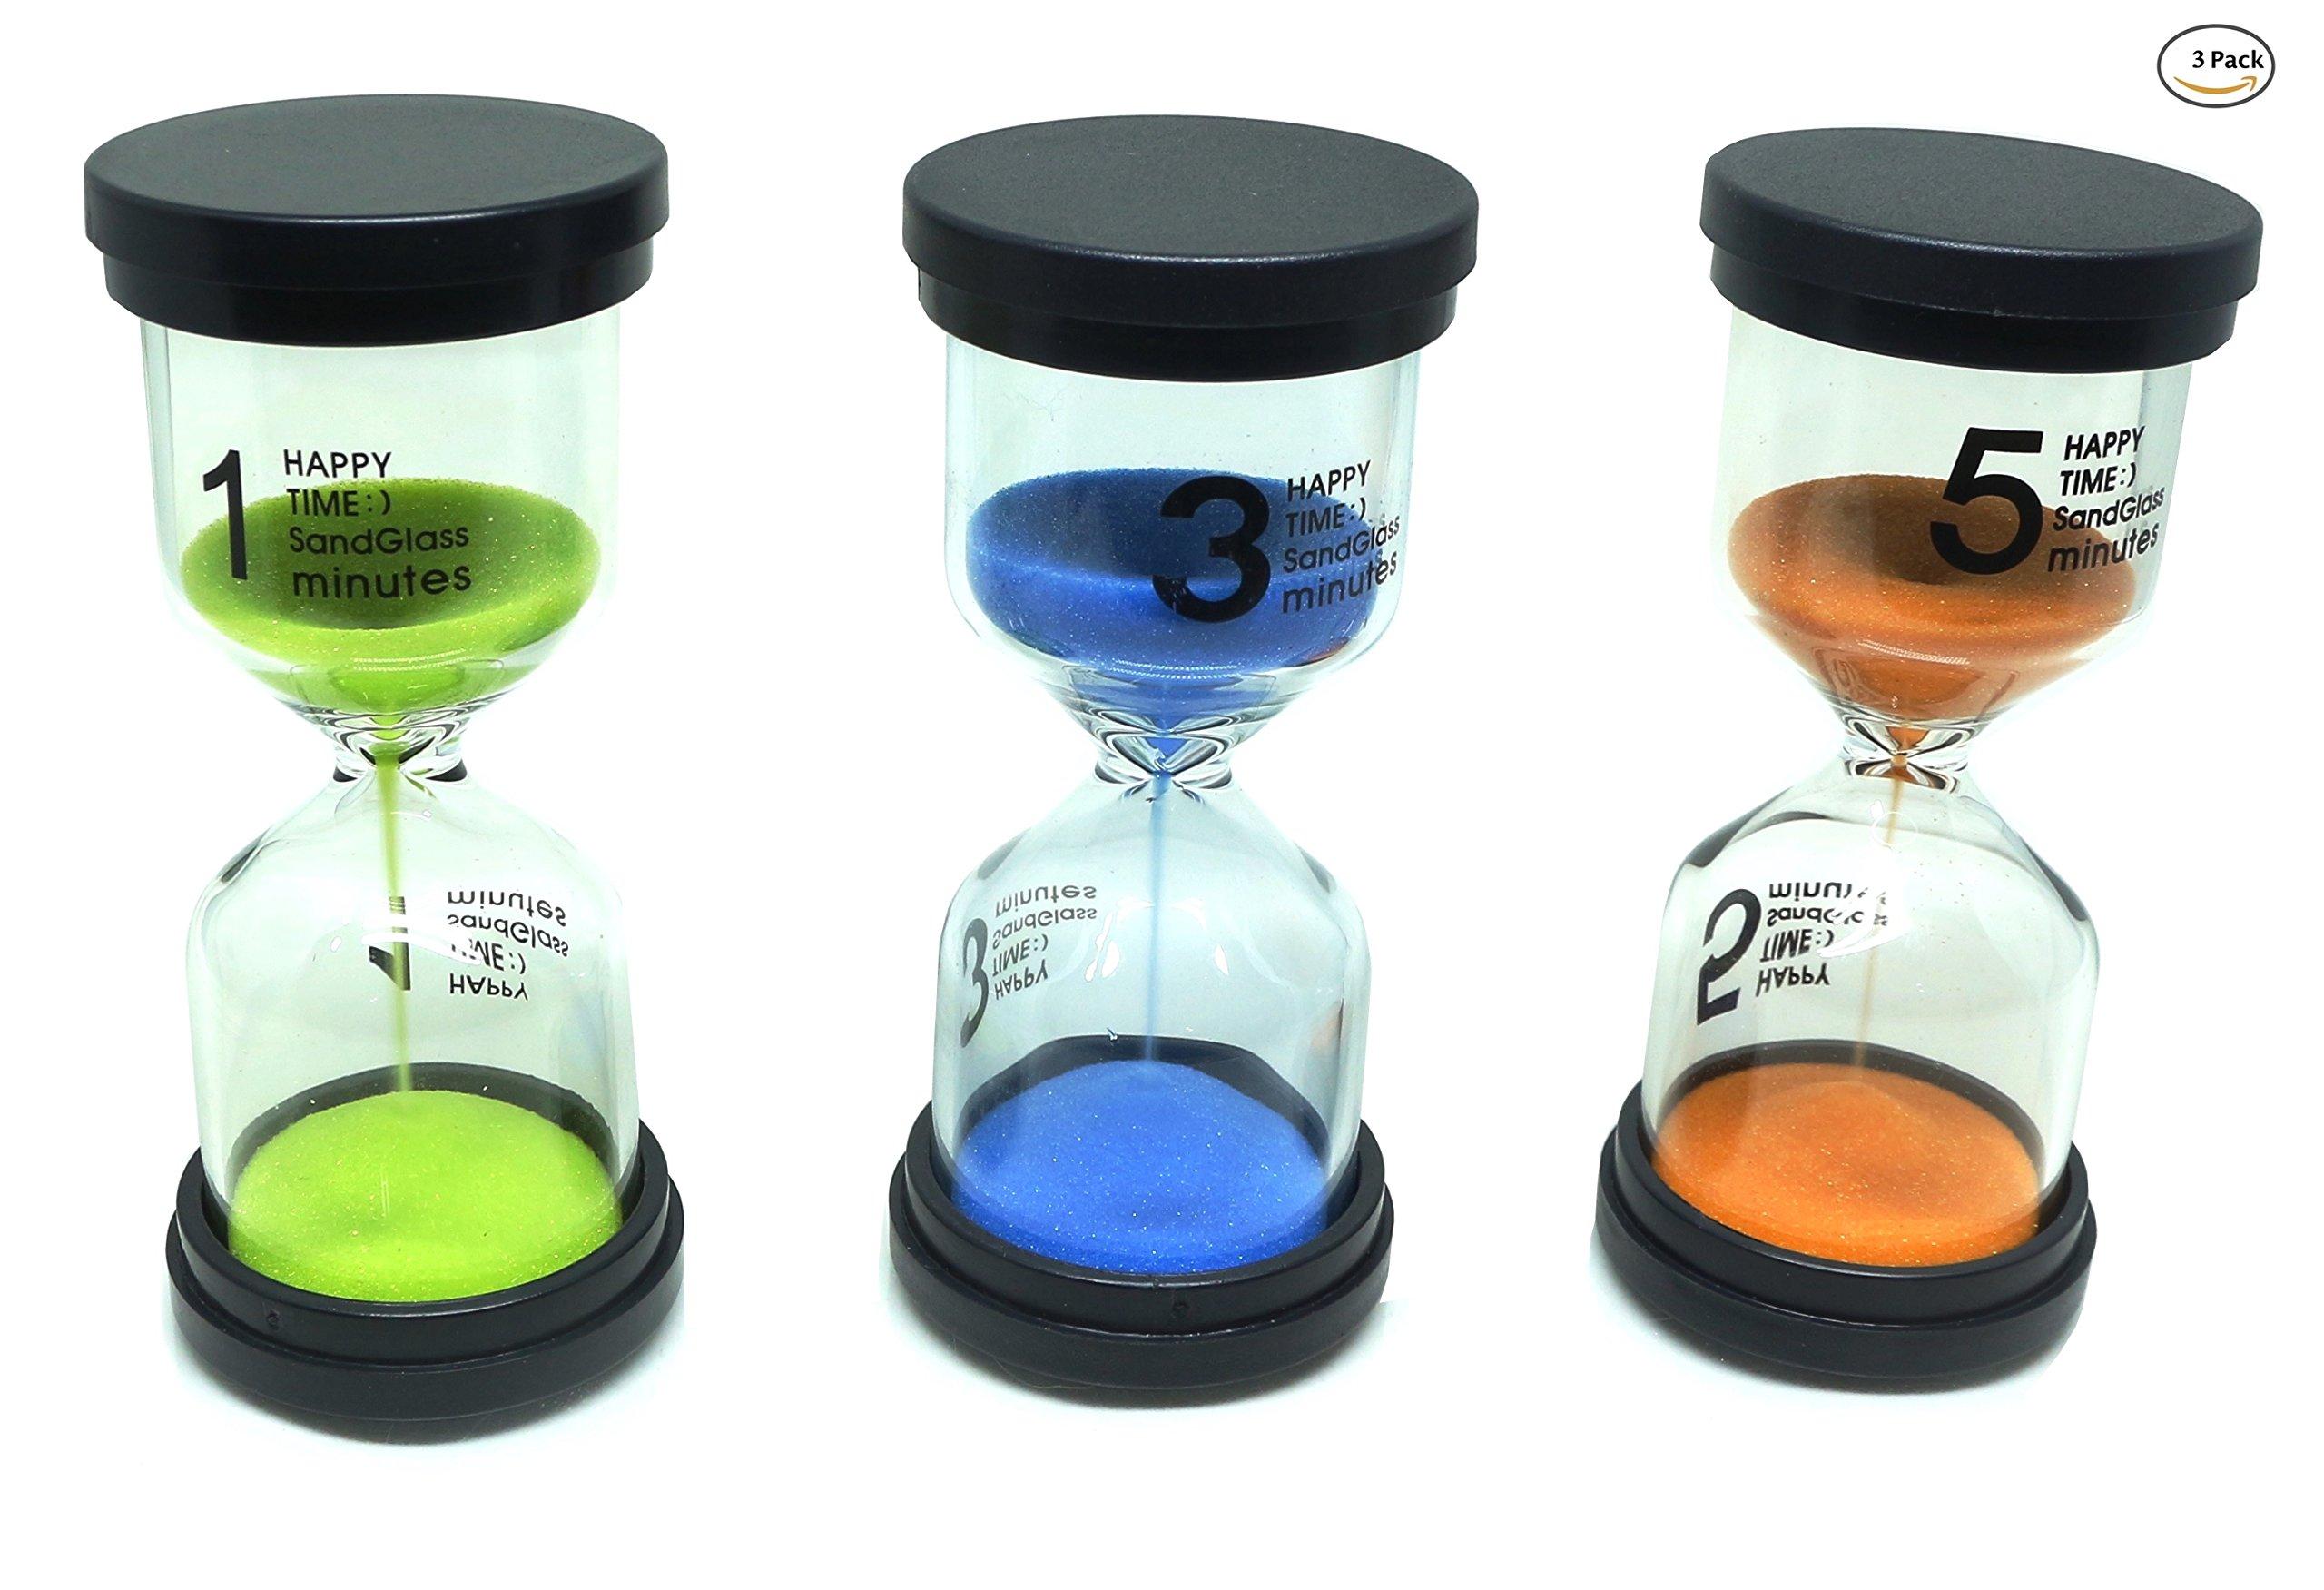 Punnarit Hourglass Sand Timer 3 Colors Sandglass Sand Clock Timer 1min / 3mins / 5mins for Kids, Classroom, Kitchen, Games, Brushing Timer, Home Office Decoration (Set 3 Pack)